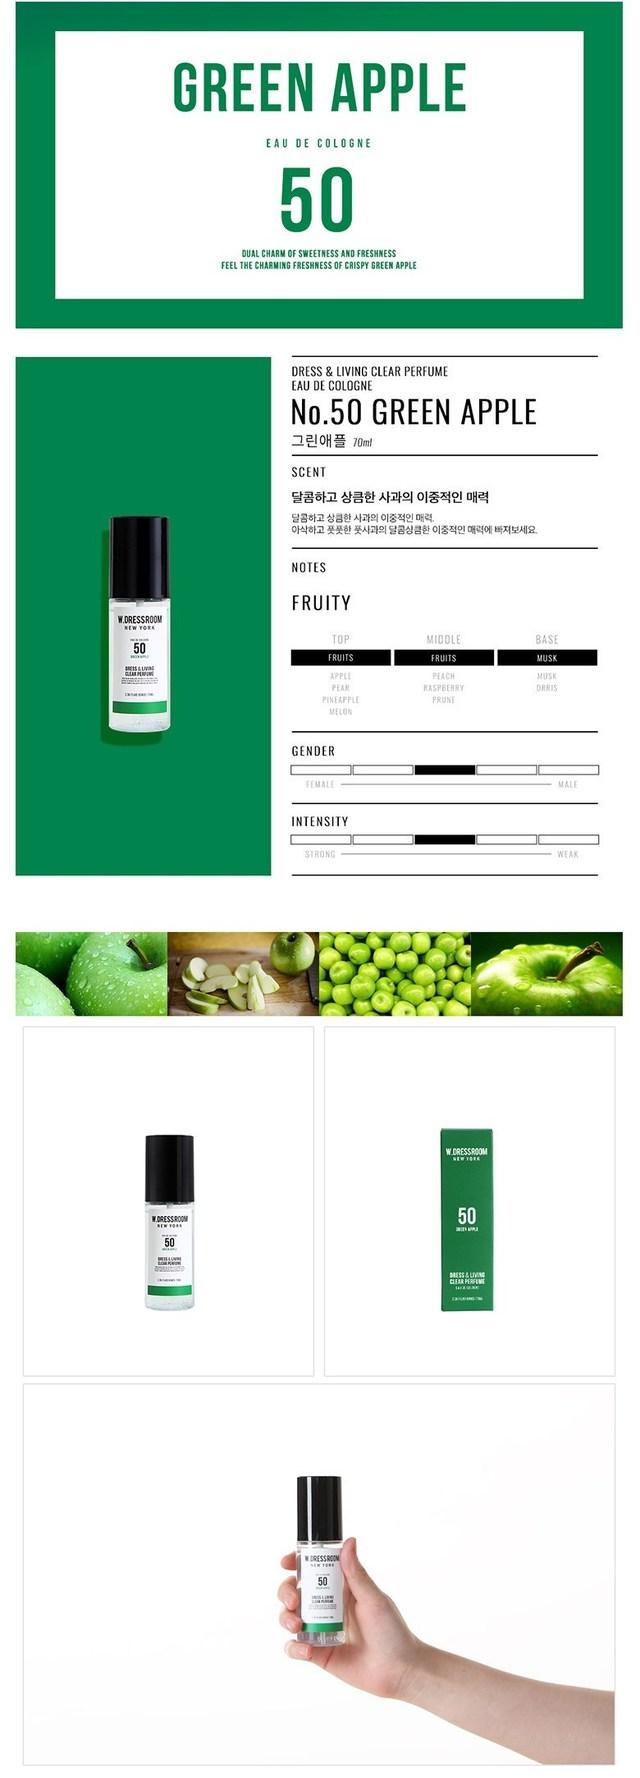 W.Dressroom] Dress & Living Clear Perfume #50 Green Apple 70ml (Weight : 110g) | MYKOCO.COM